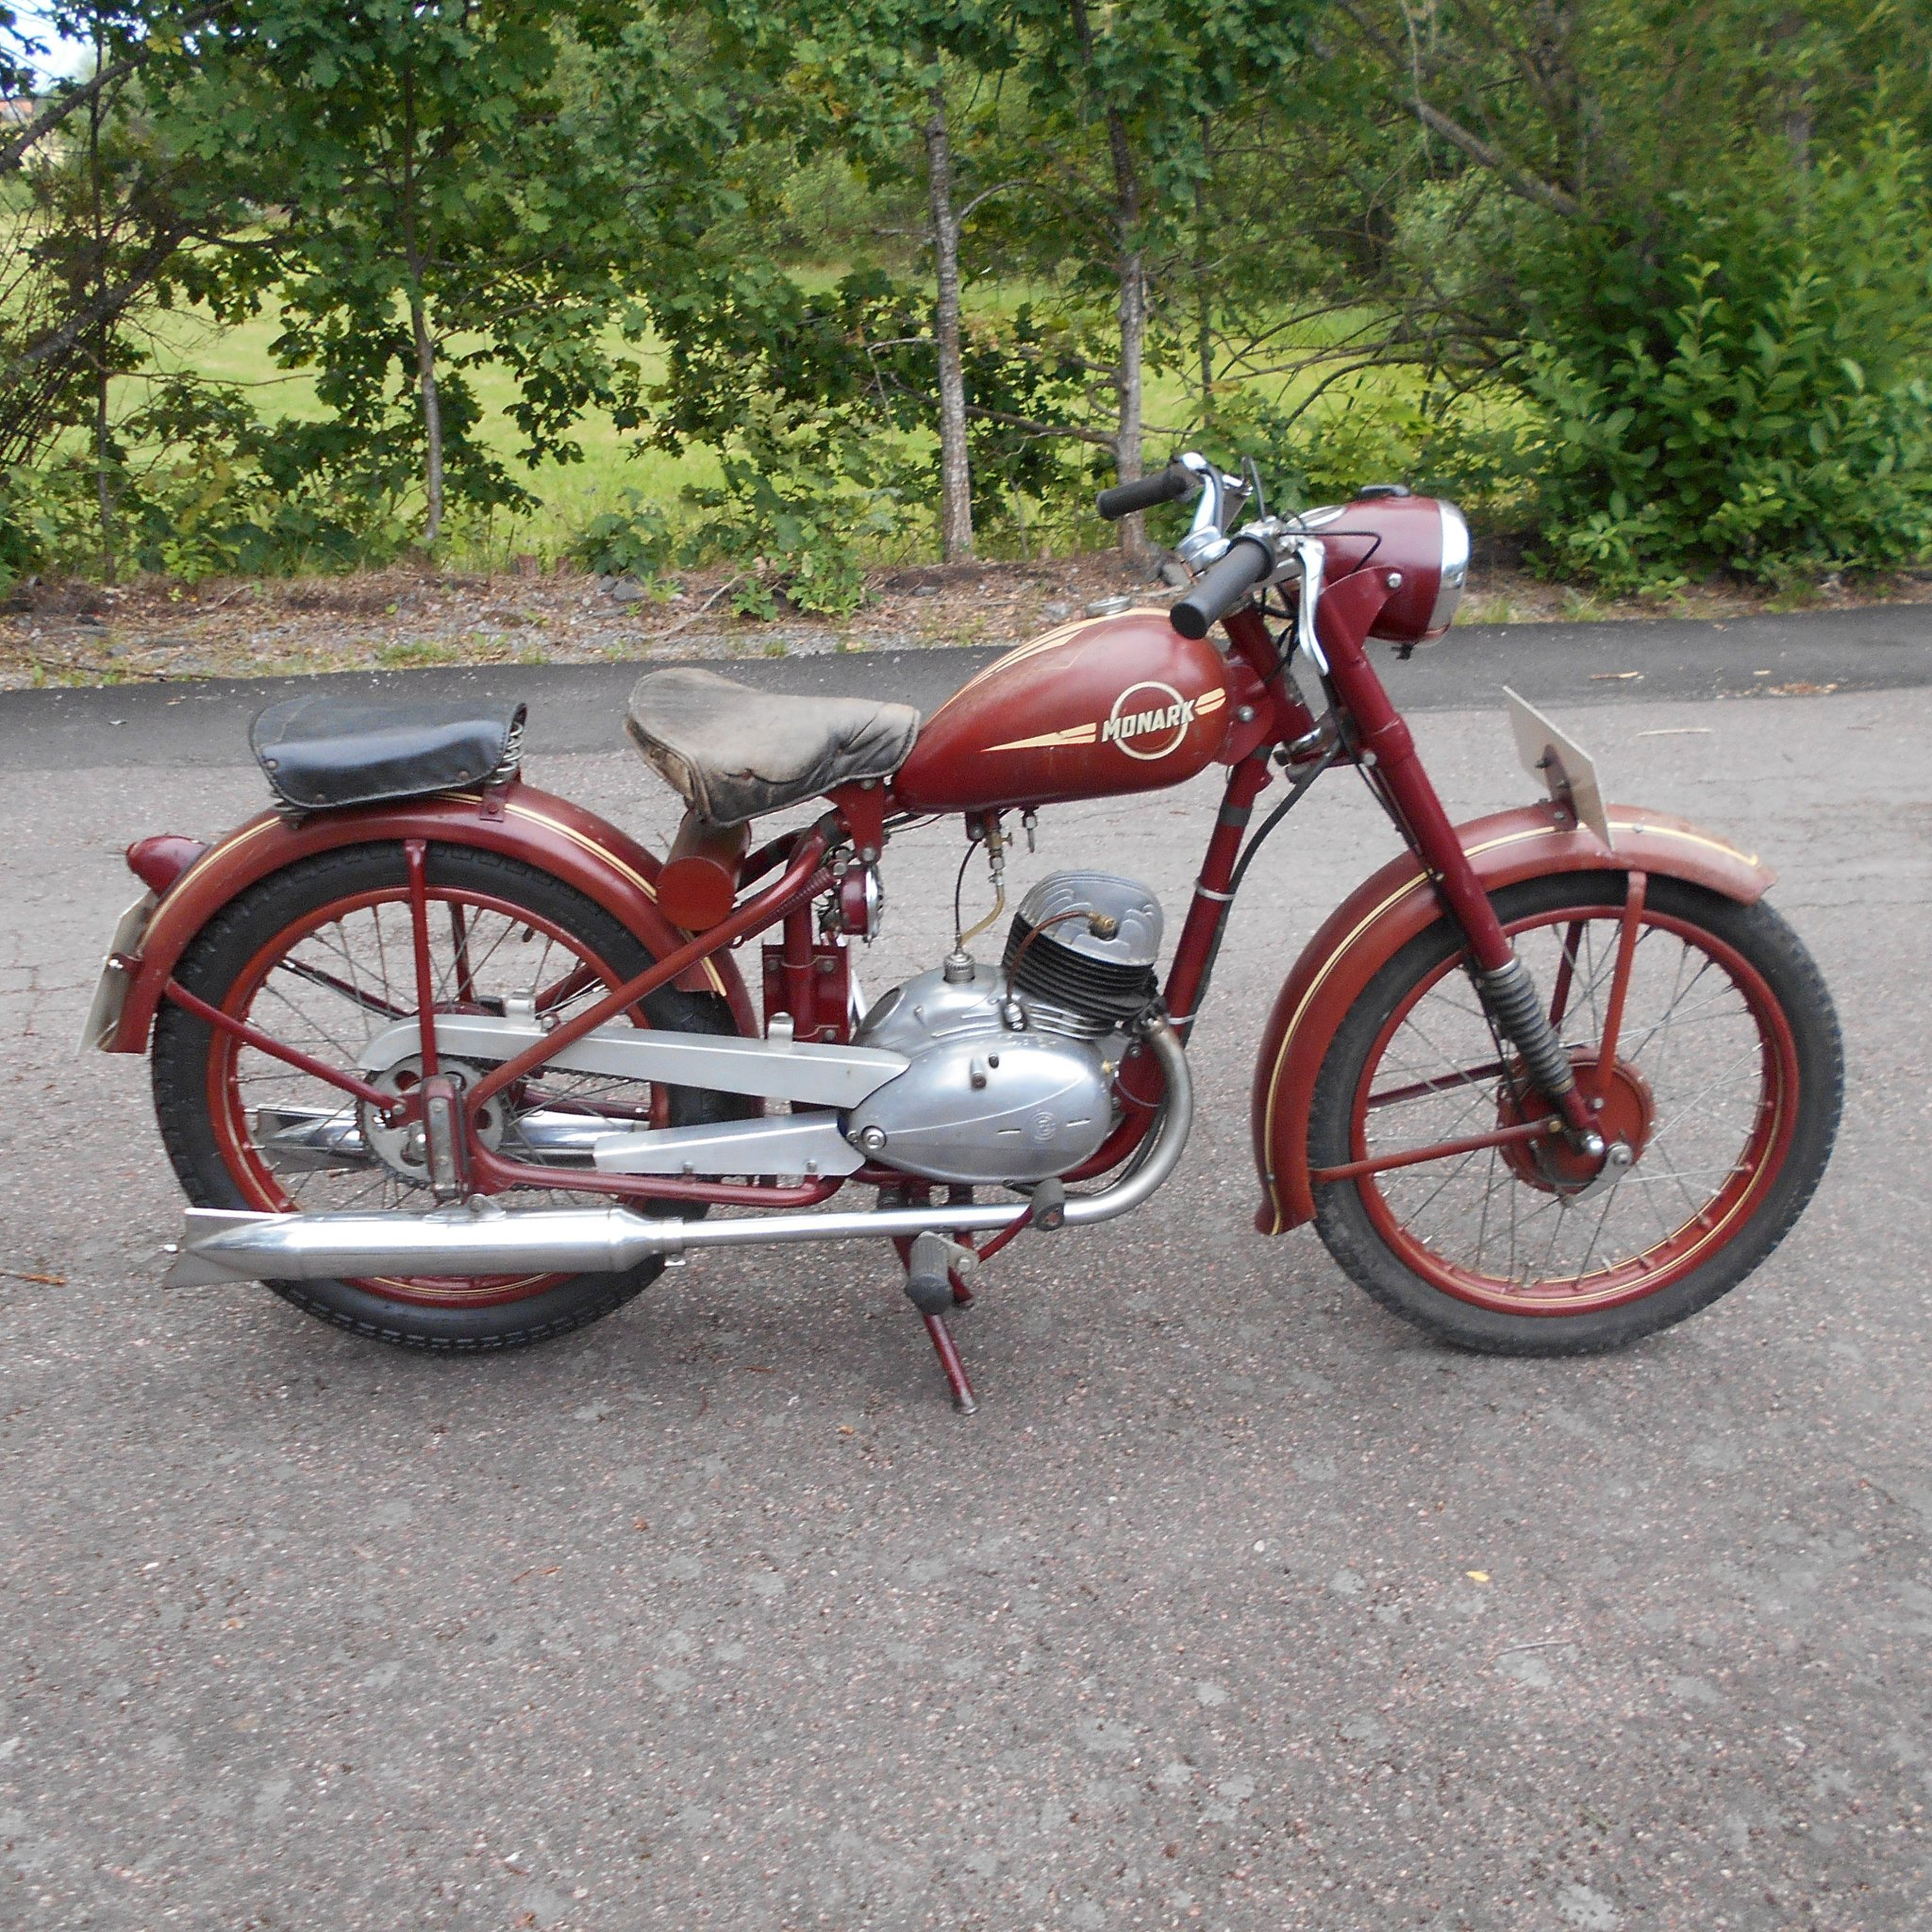 Nieuw Monark modell 300 med 150cc CZ motor 1950 (357035411) ᐈ Köp på HS-25